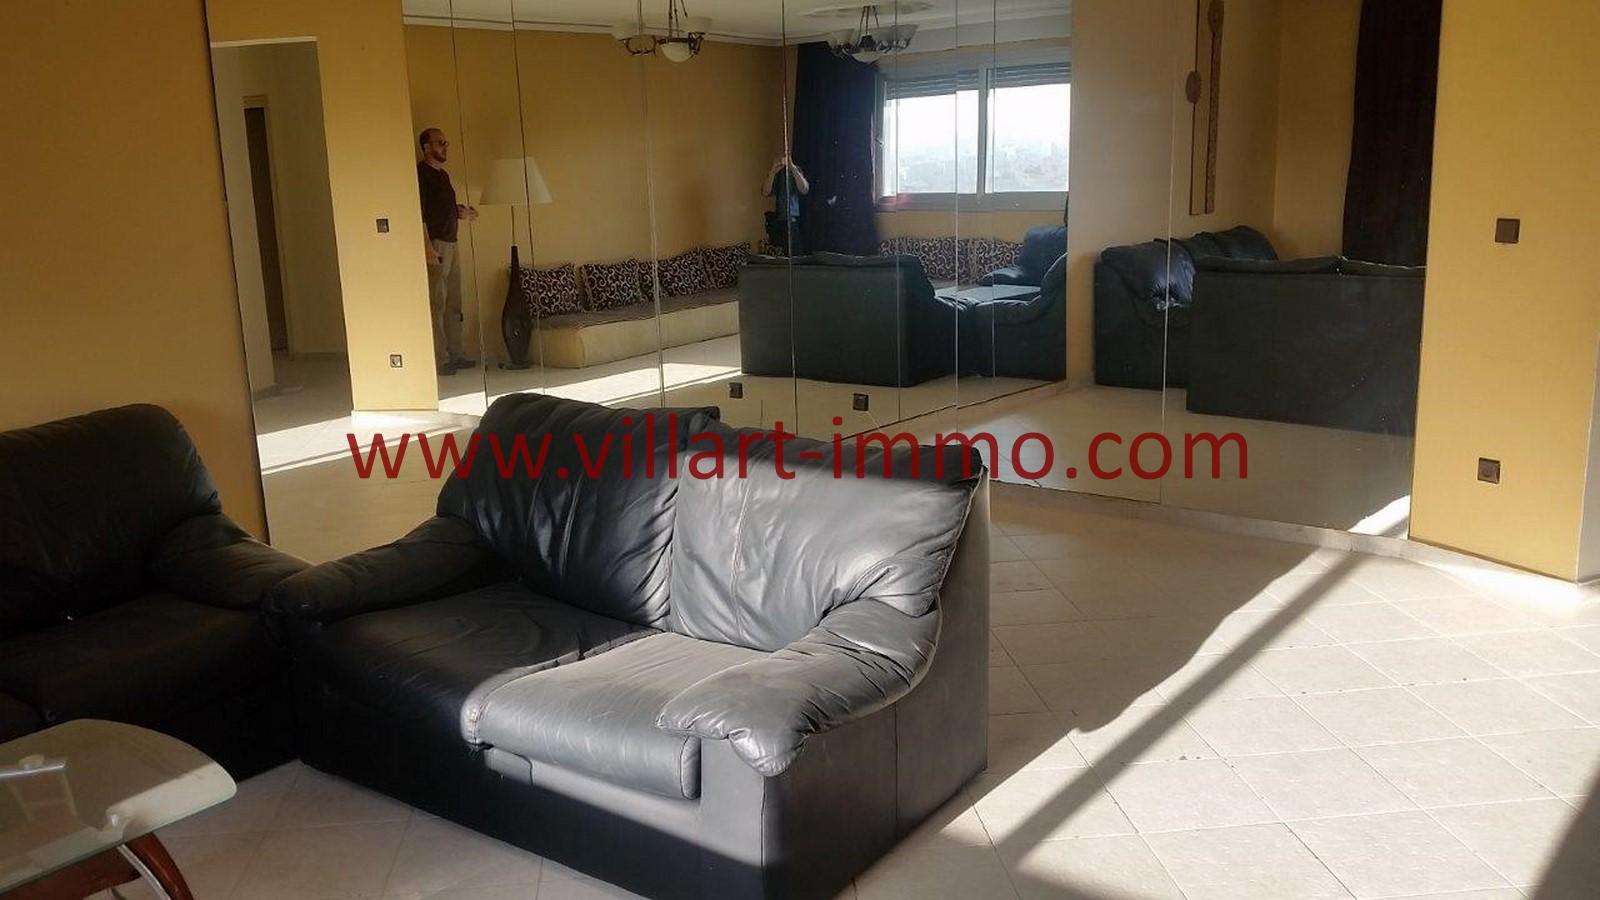 2-location-appartement-meubles-tanger-iberia-salon-2-l1012-villart-immo-maroc